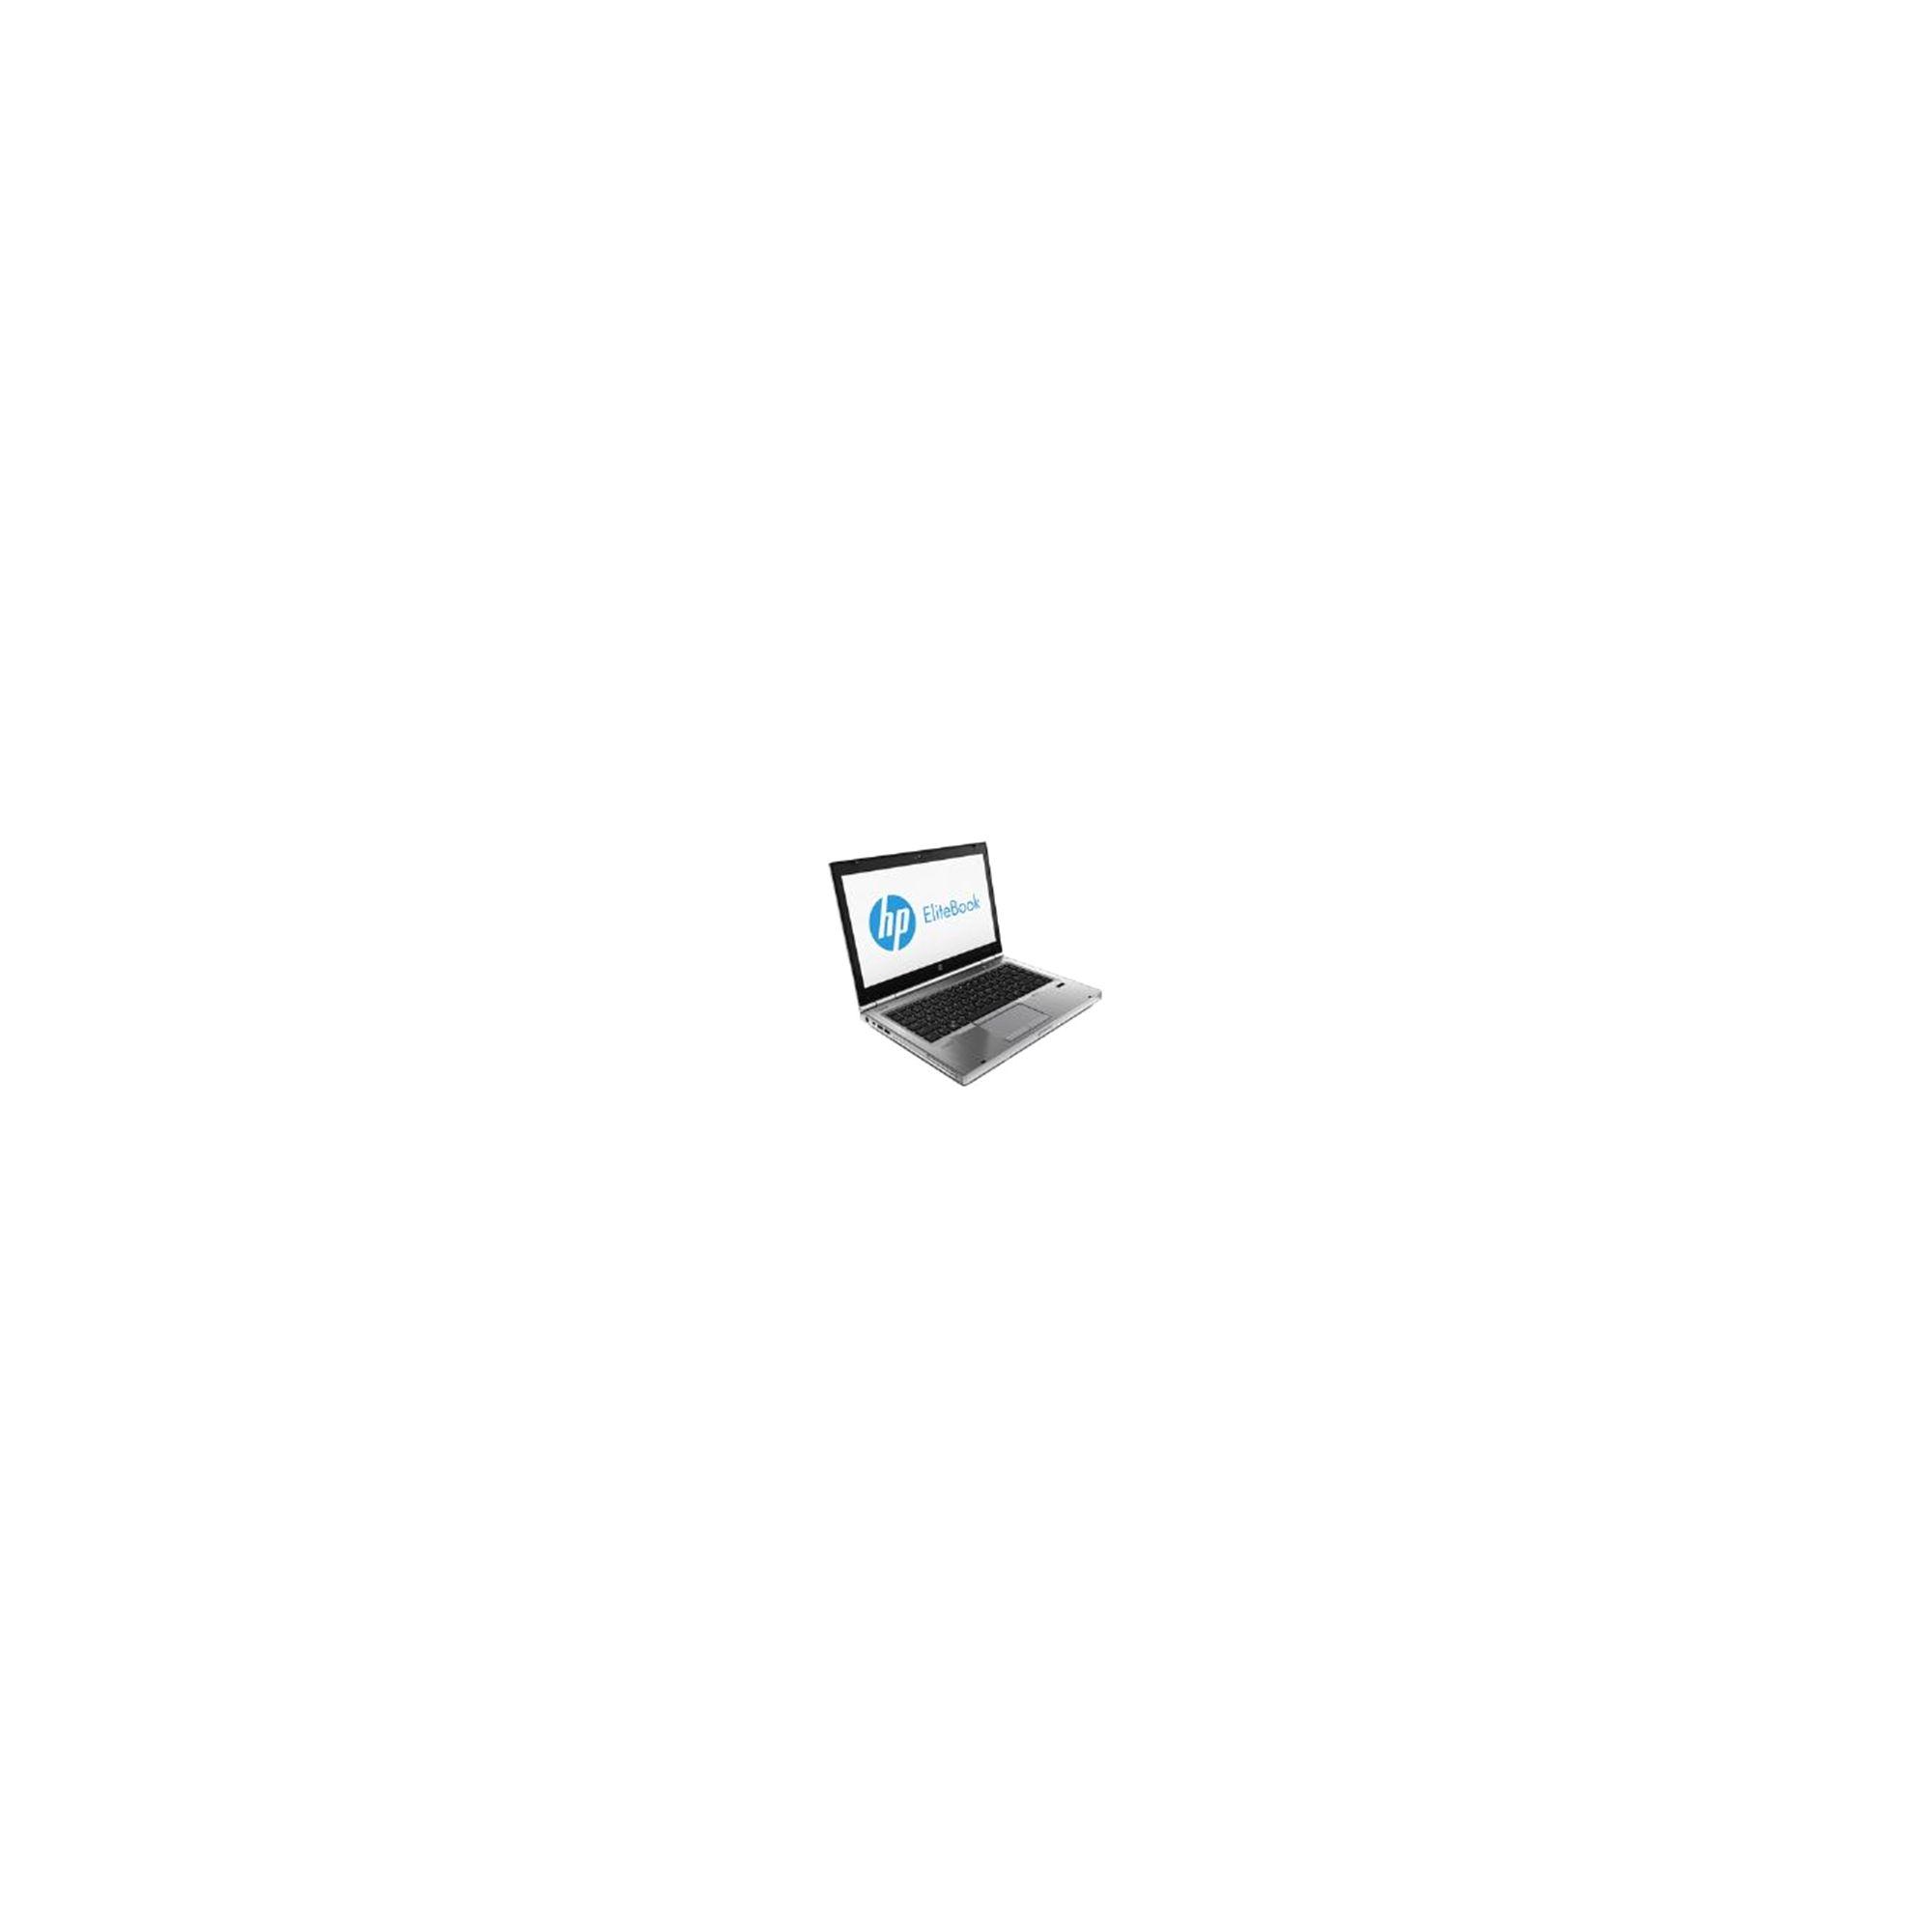 HP EliteBook 8470p (14 inch) Notebook Core i5 (3320M) 2.6GHz 4GB 500GB DVD?RW SM DL WLAN BT Webcam Windows 7 Pro 64-bit (Radeon HD 7570M 1GB)